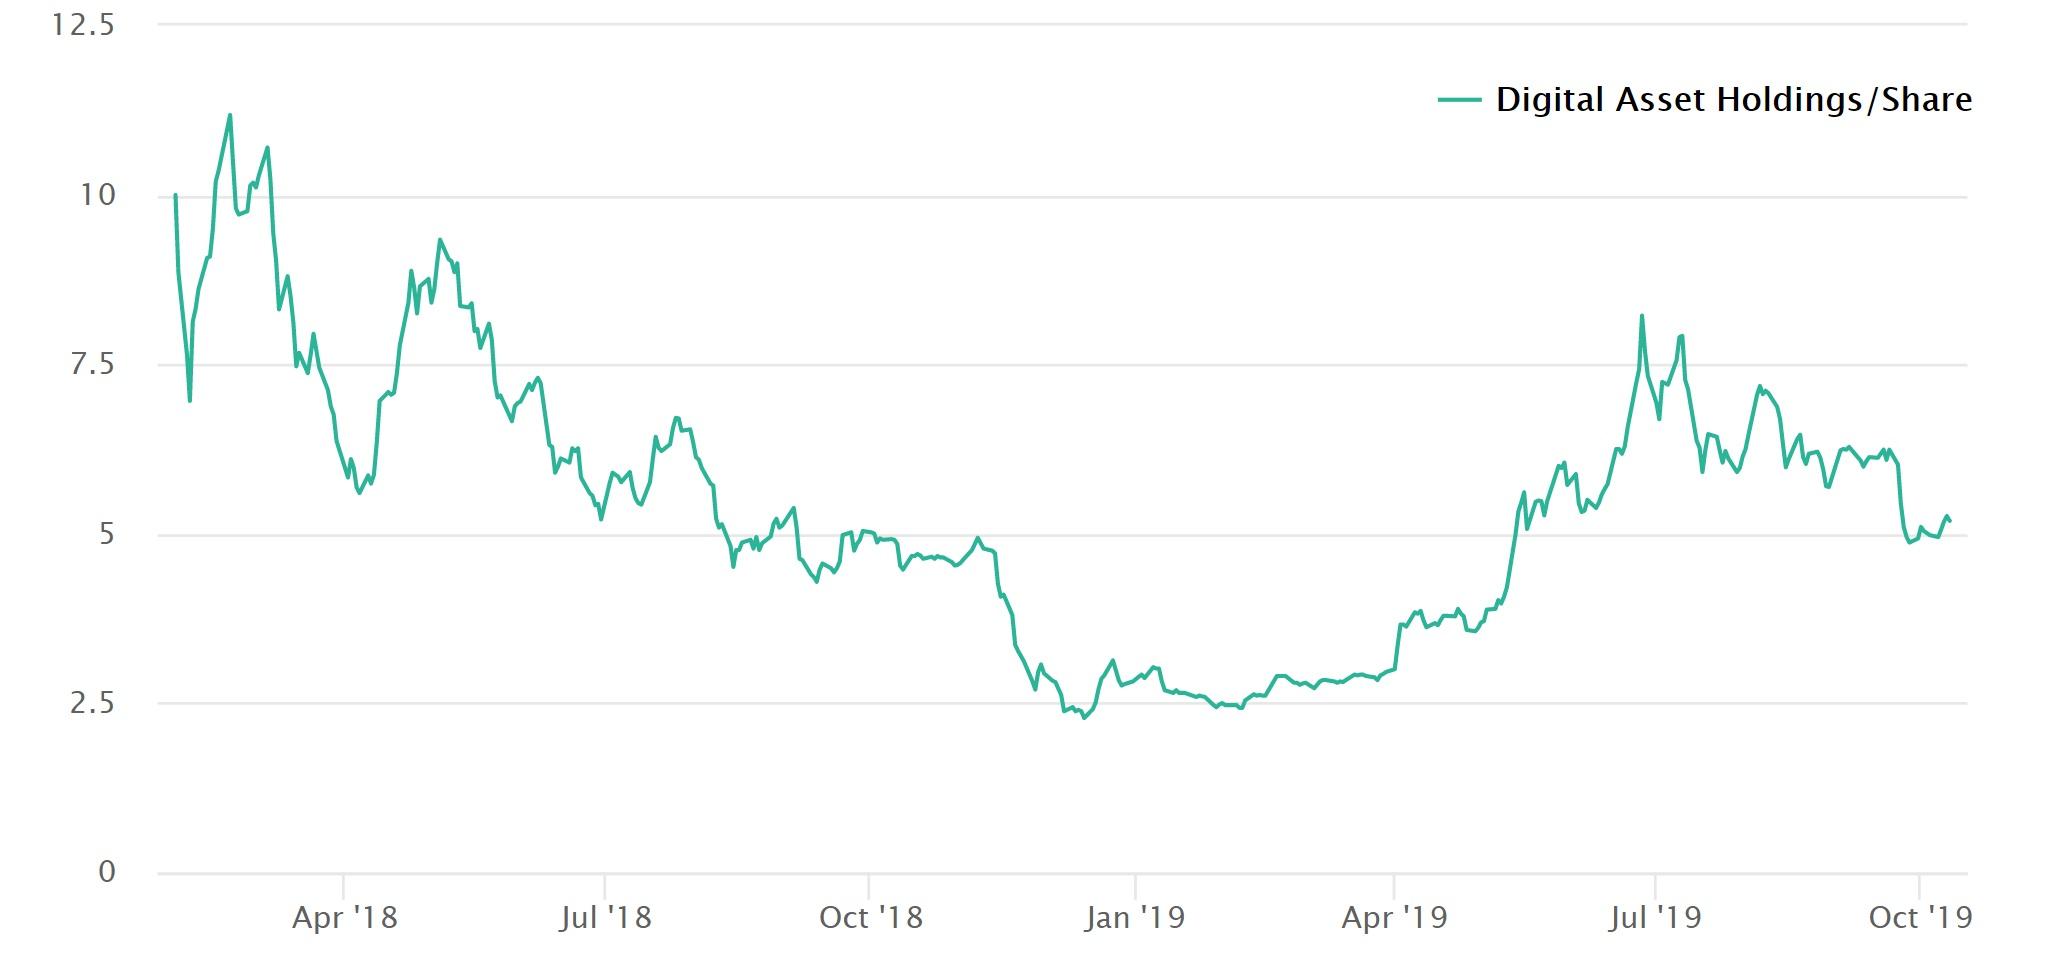 "Diversified Crypto Fund recibe la aprobación reglamentaria de los Estados Unidos ""width ="" 2063 ""height ="" 966 ""srcset ="" https://blackswanfinances.com/wp-content/uploads/2019/10/chart.jpg 2063w, https://news.bitcoin.com/wp-content/uploads/2019/10/ chart-300x140.jpg 300w, https://news.bitcoin.com/wp-content/uploads/2019/10/chart-768x360.jpg 768w, https://news.bitcoin.com/wp-content/uploads/ 2019/10 / chart-1024x479.jpg 1024w, https://news.bitcoin.com/wp-content/uploads/2019/10/chart-696x326.jpg 696w, https://news.bitcoin.com/wp- content / uploads / 2019/10 / chart-1392x652.jpg 1392w, https://news.bitcoin.com/wp-content/uploads/2019/10/chart-1068x500.jpg 1068w, https: //news.bitcoin. com / wp-content / uploads / 2019/10 / chart-897x420.jpg 897w ""tamaños ="" (ancho máximo: 2063px) 100vw, 2063px"